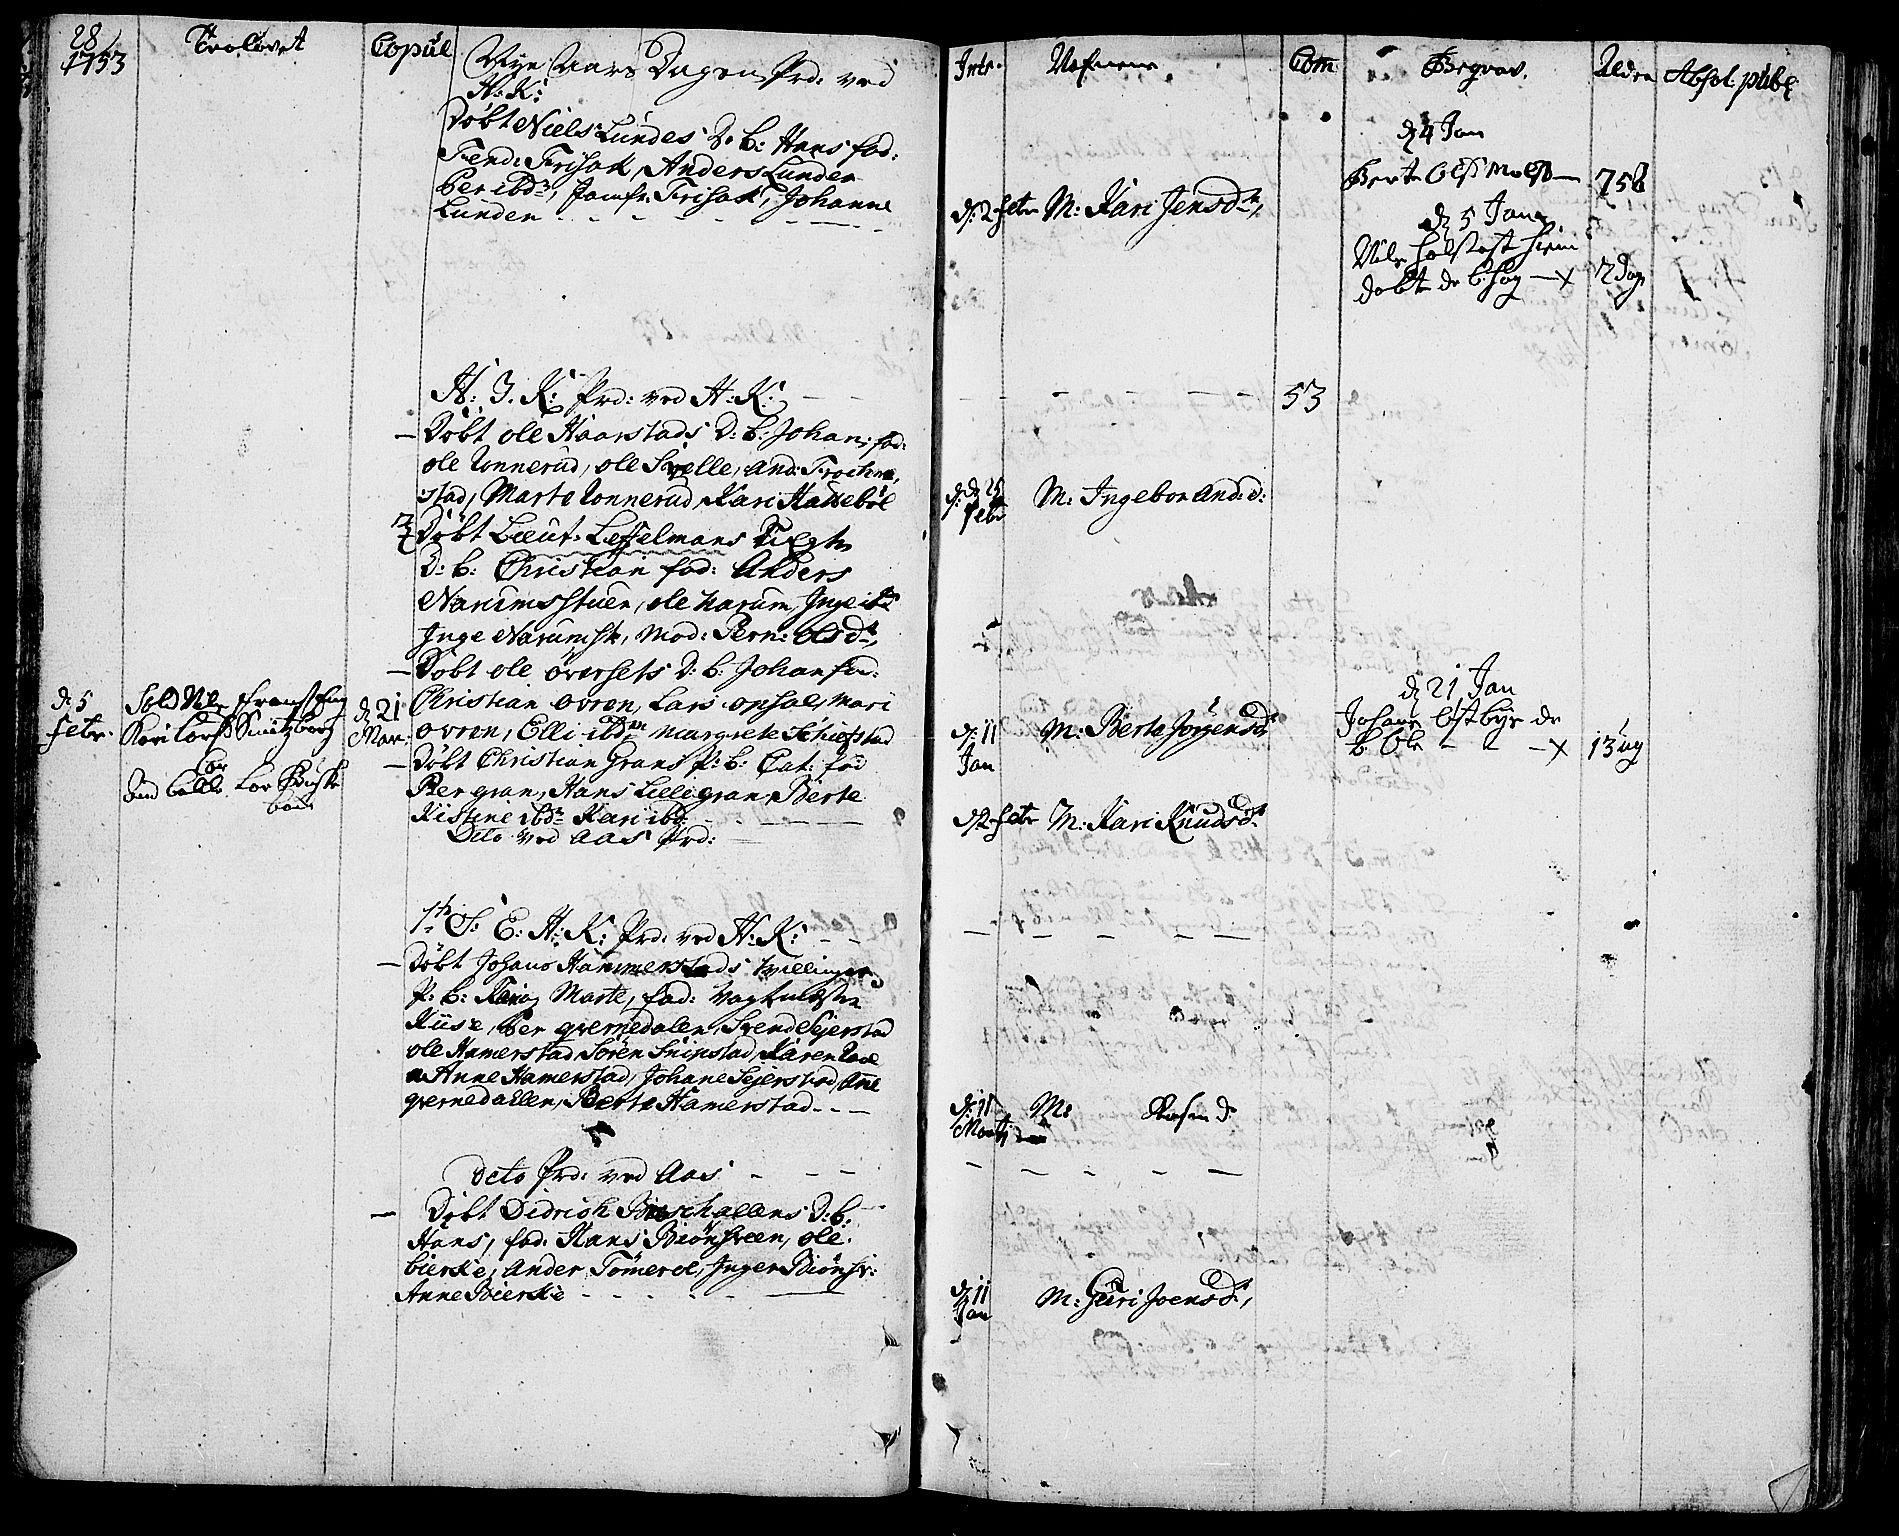 SAH, Toten prestekontor, Ministerialbok nr. 4, 1751-1761, s. 28